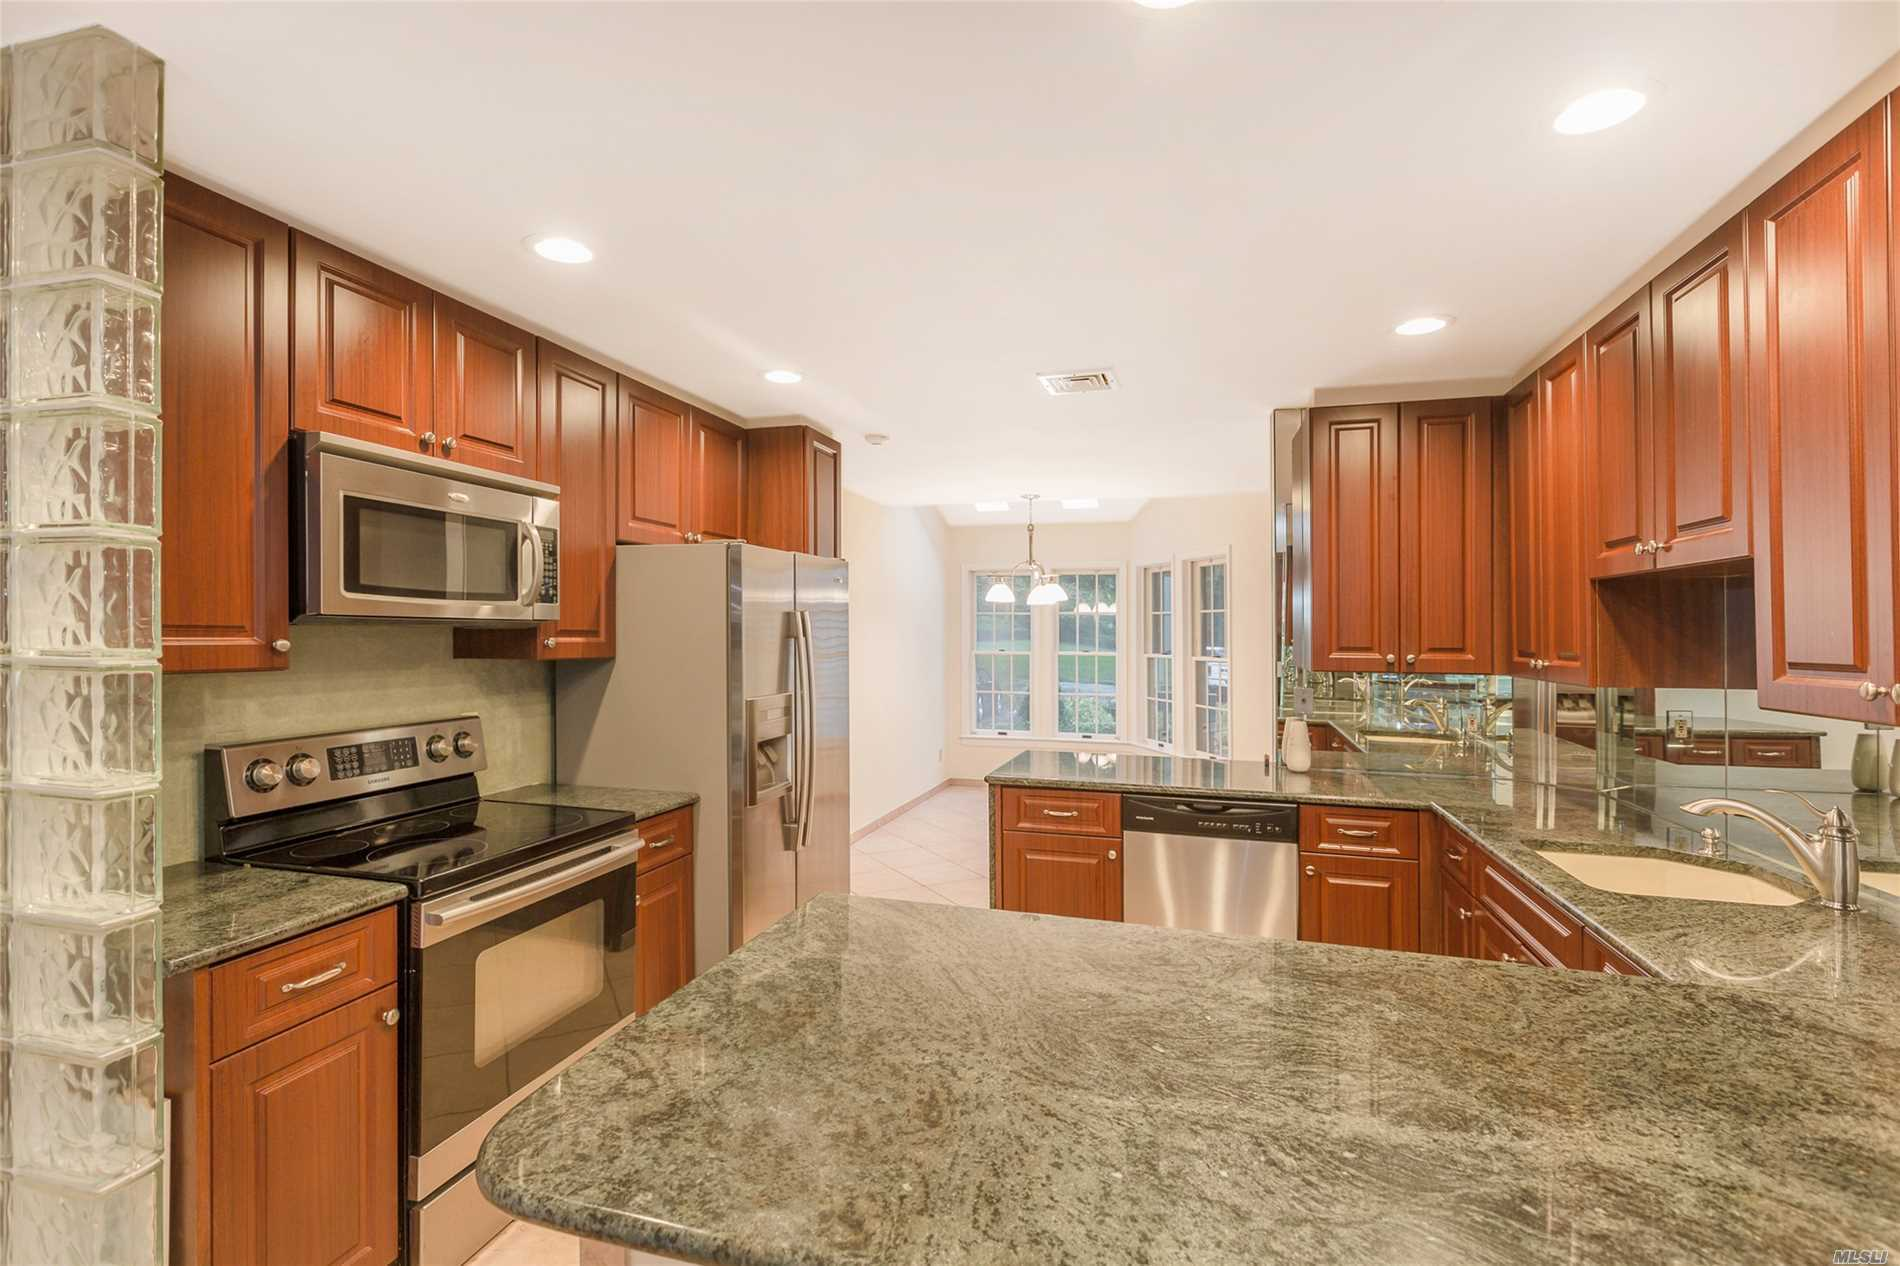 Property for sale at 203 Mountain Ridge Ct, Mt. Sinai,  NY 11766